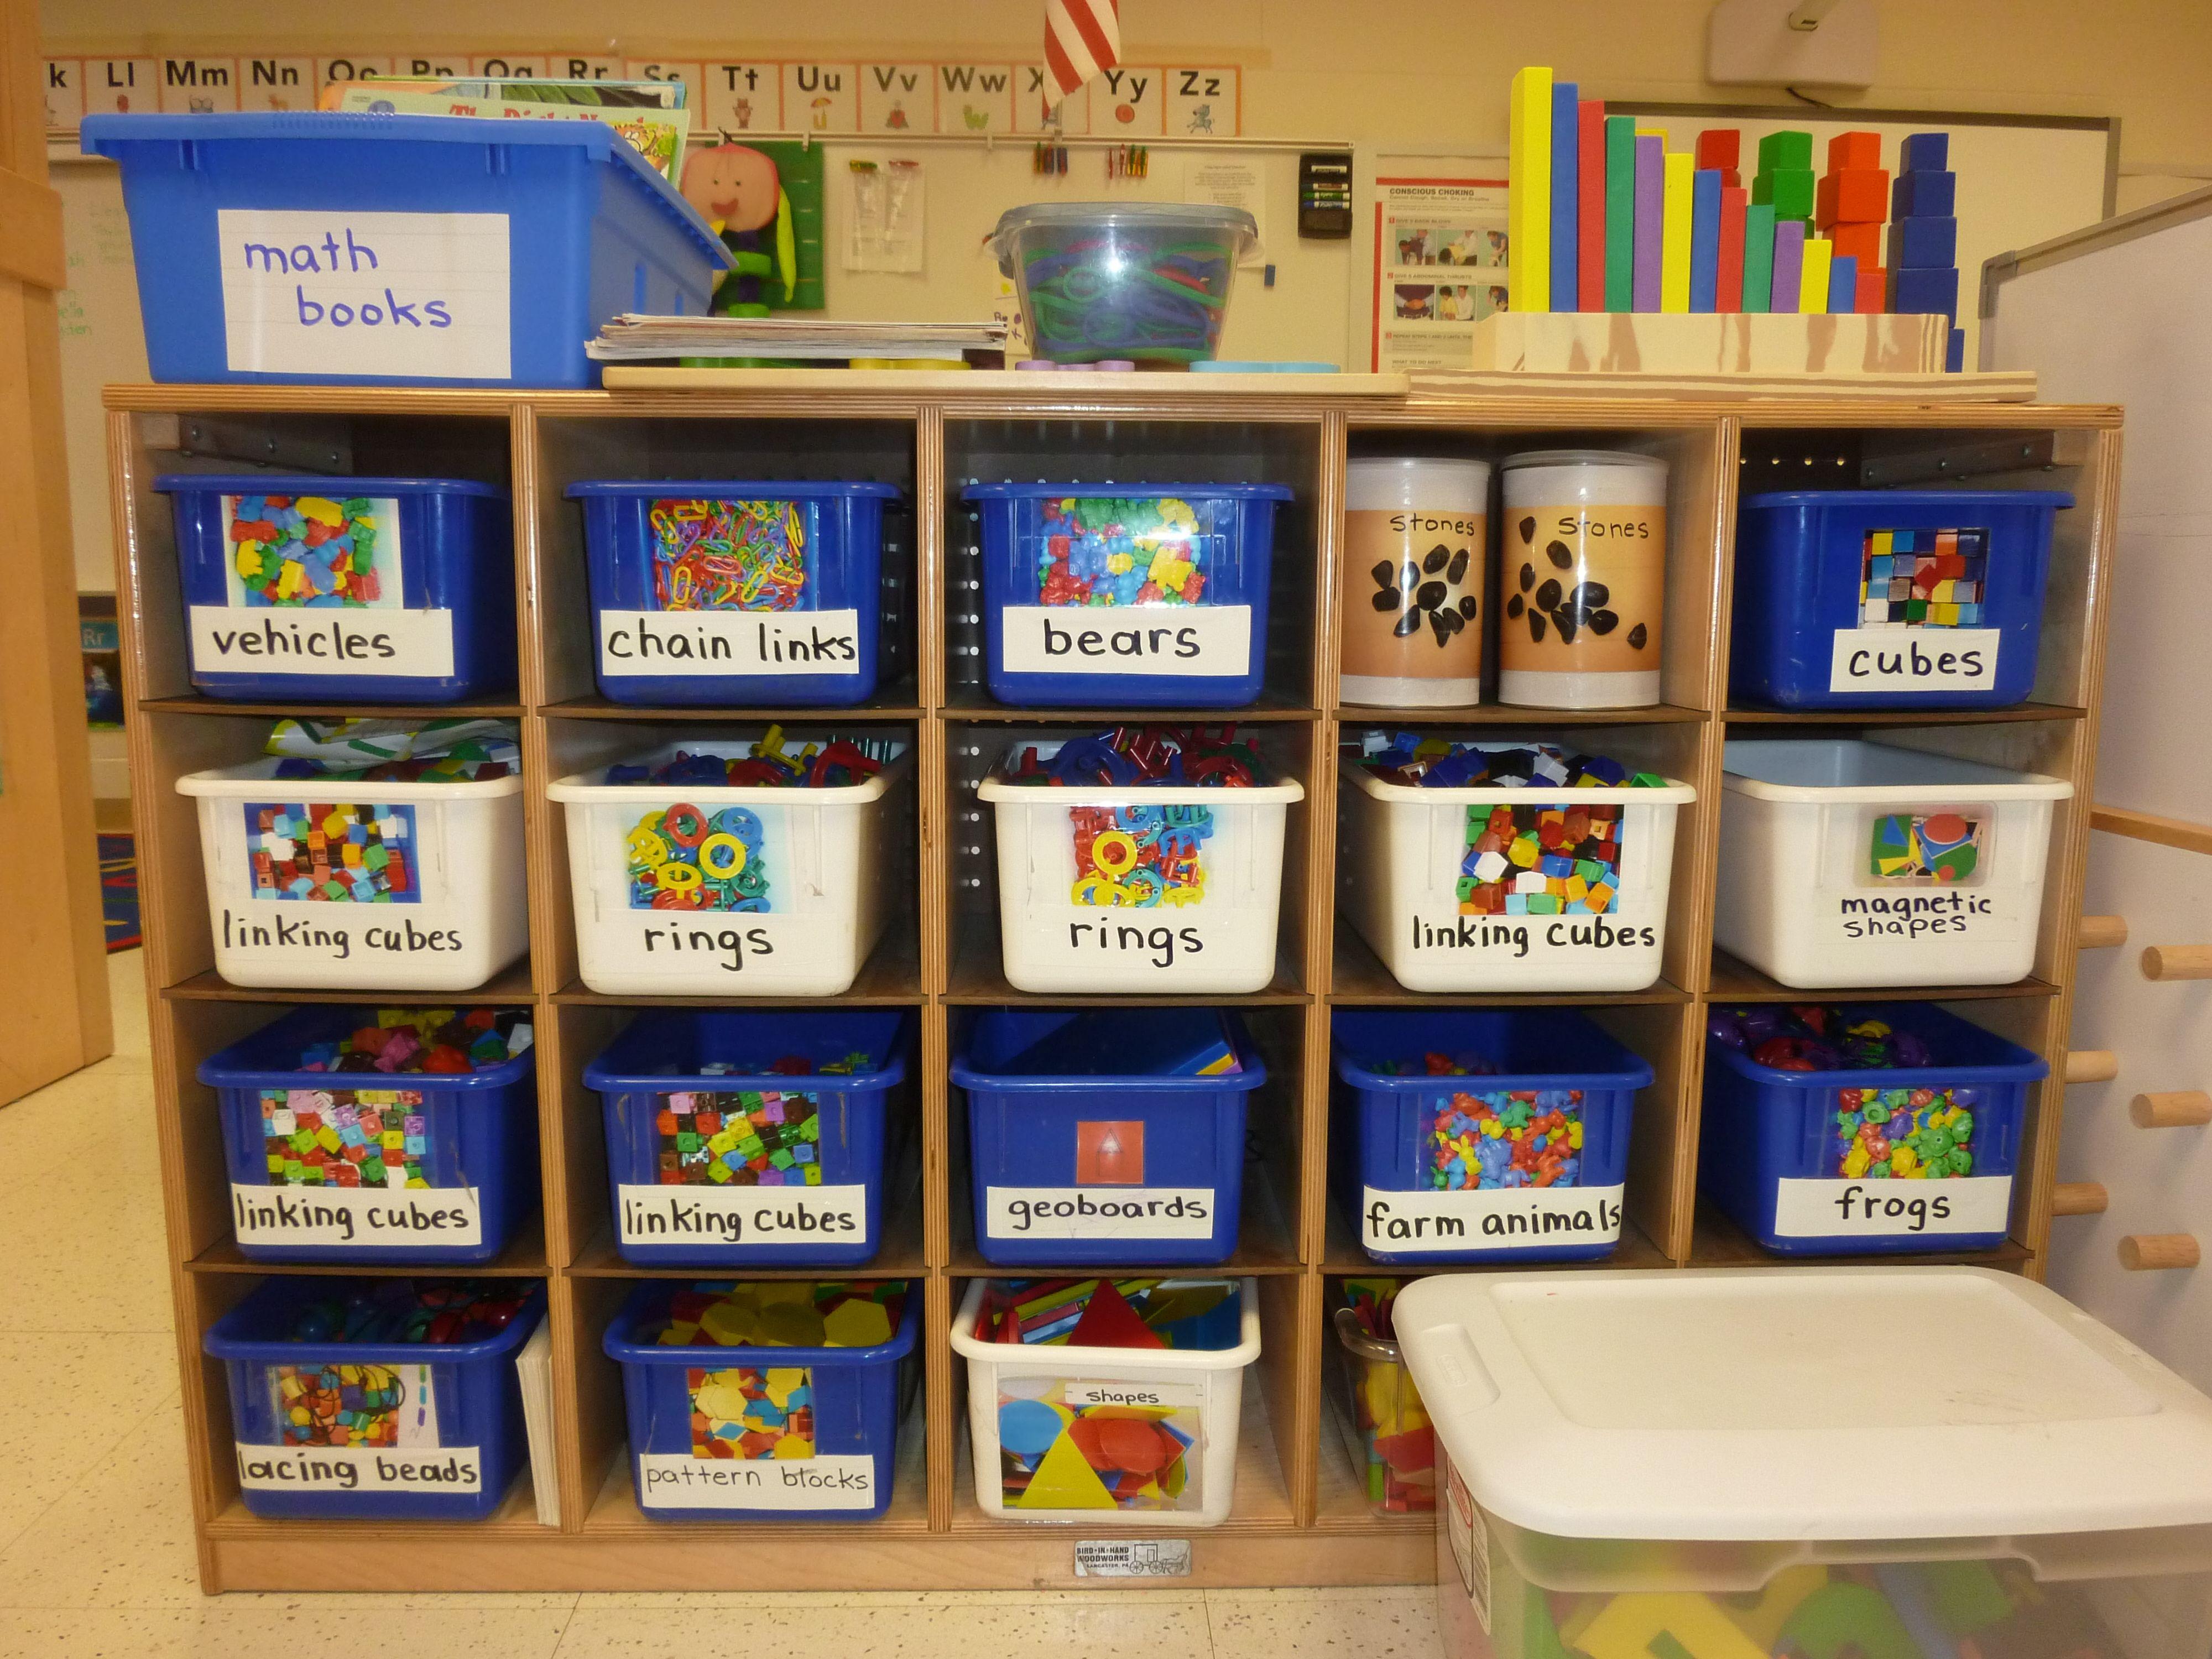 Centers for ECERS Preschool, Preschool centers, Math books